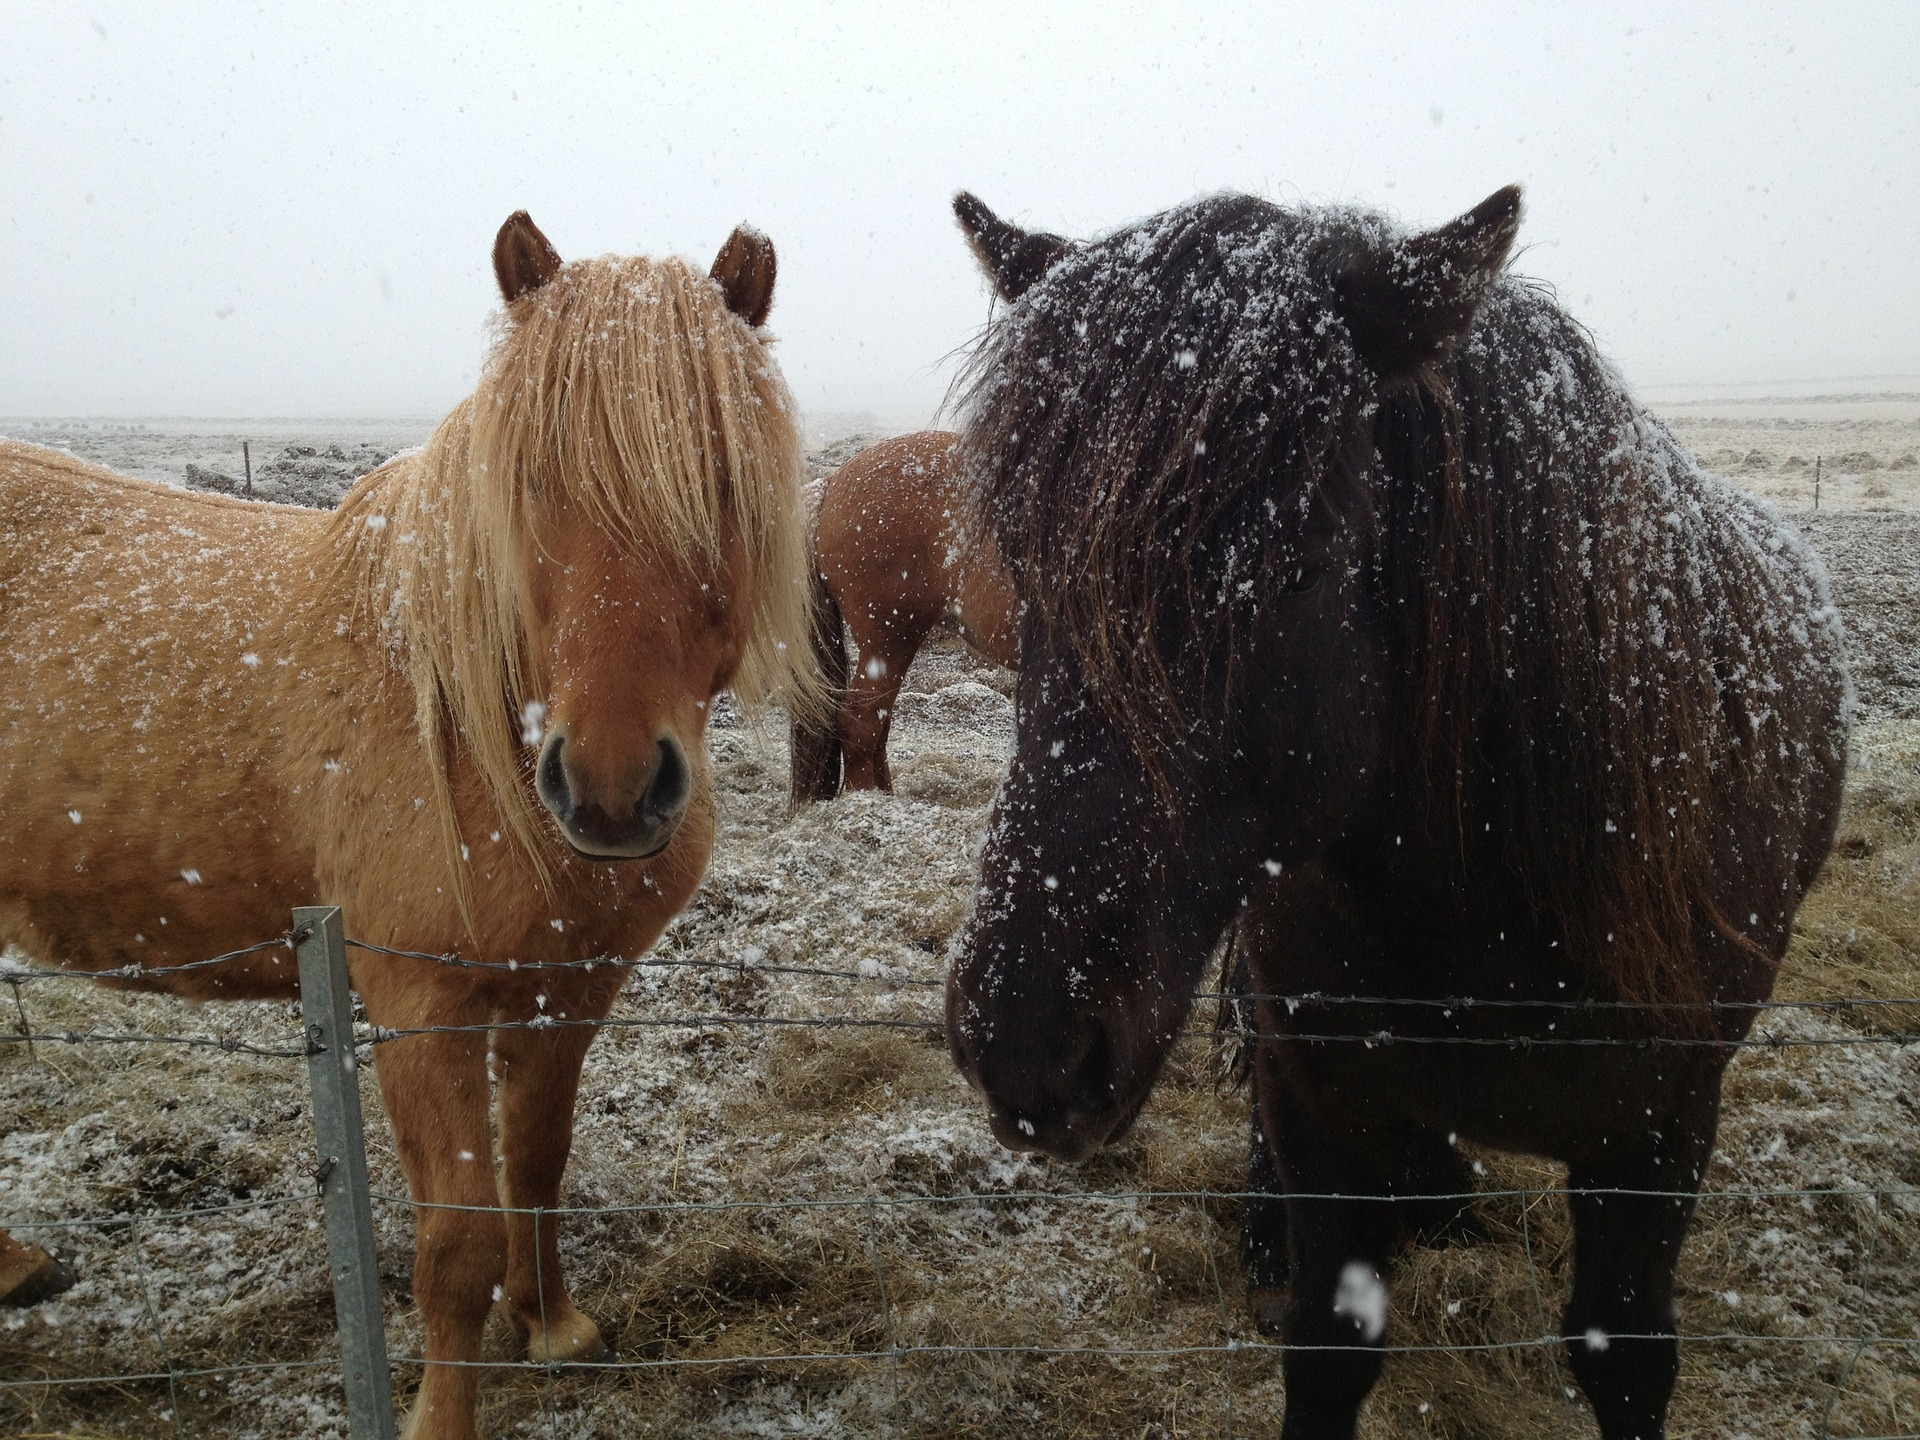 icelandic-horses-180535_1920.jpg